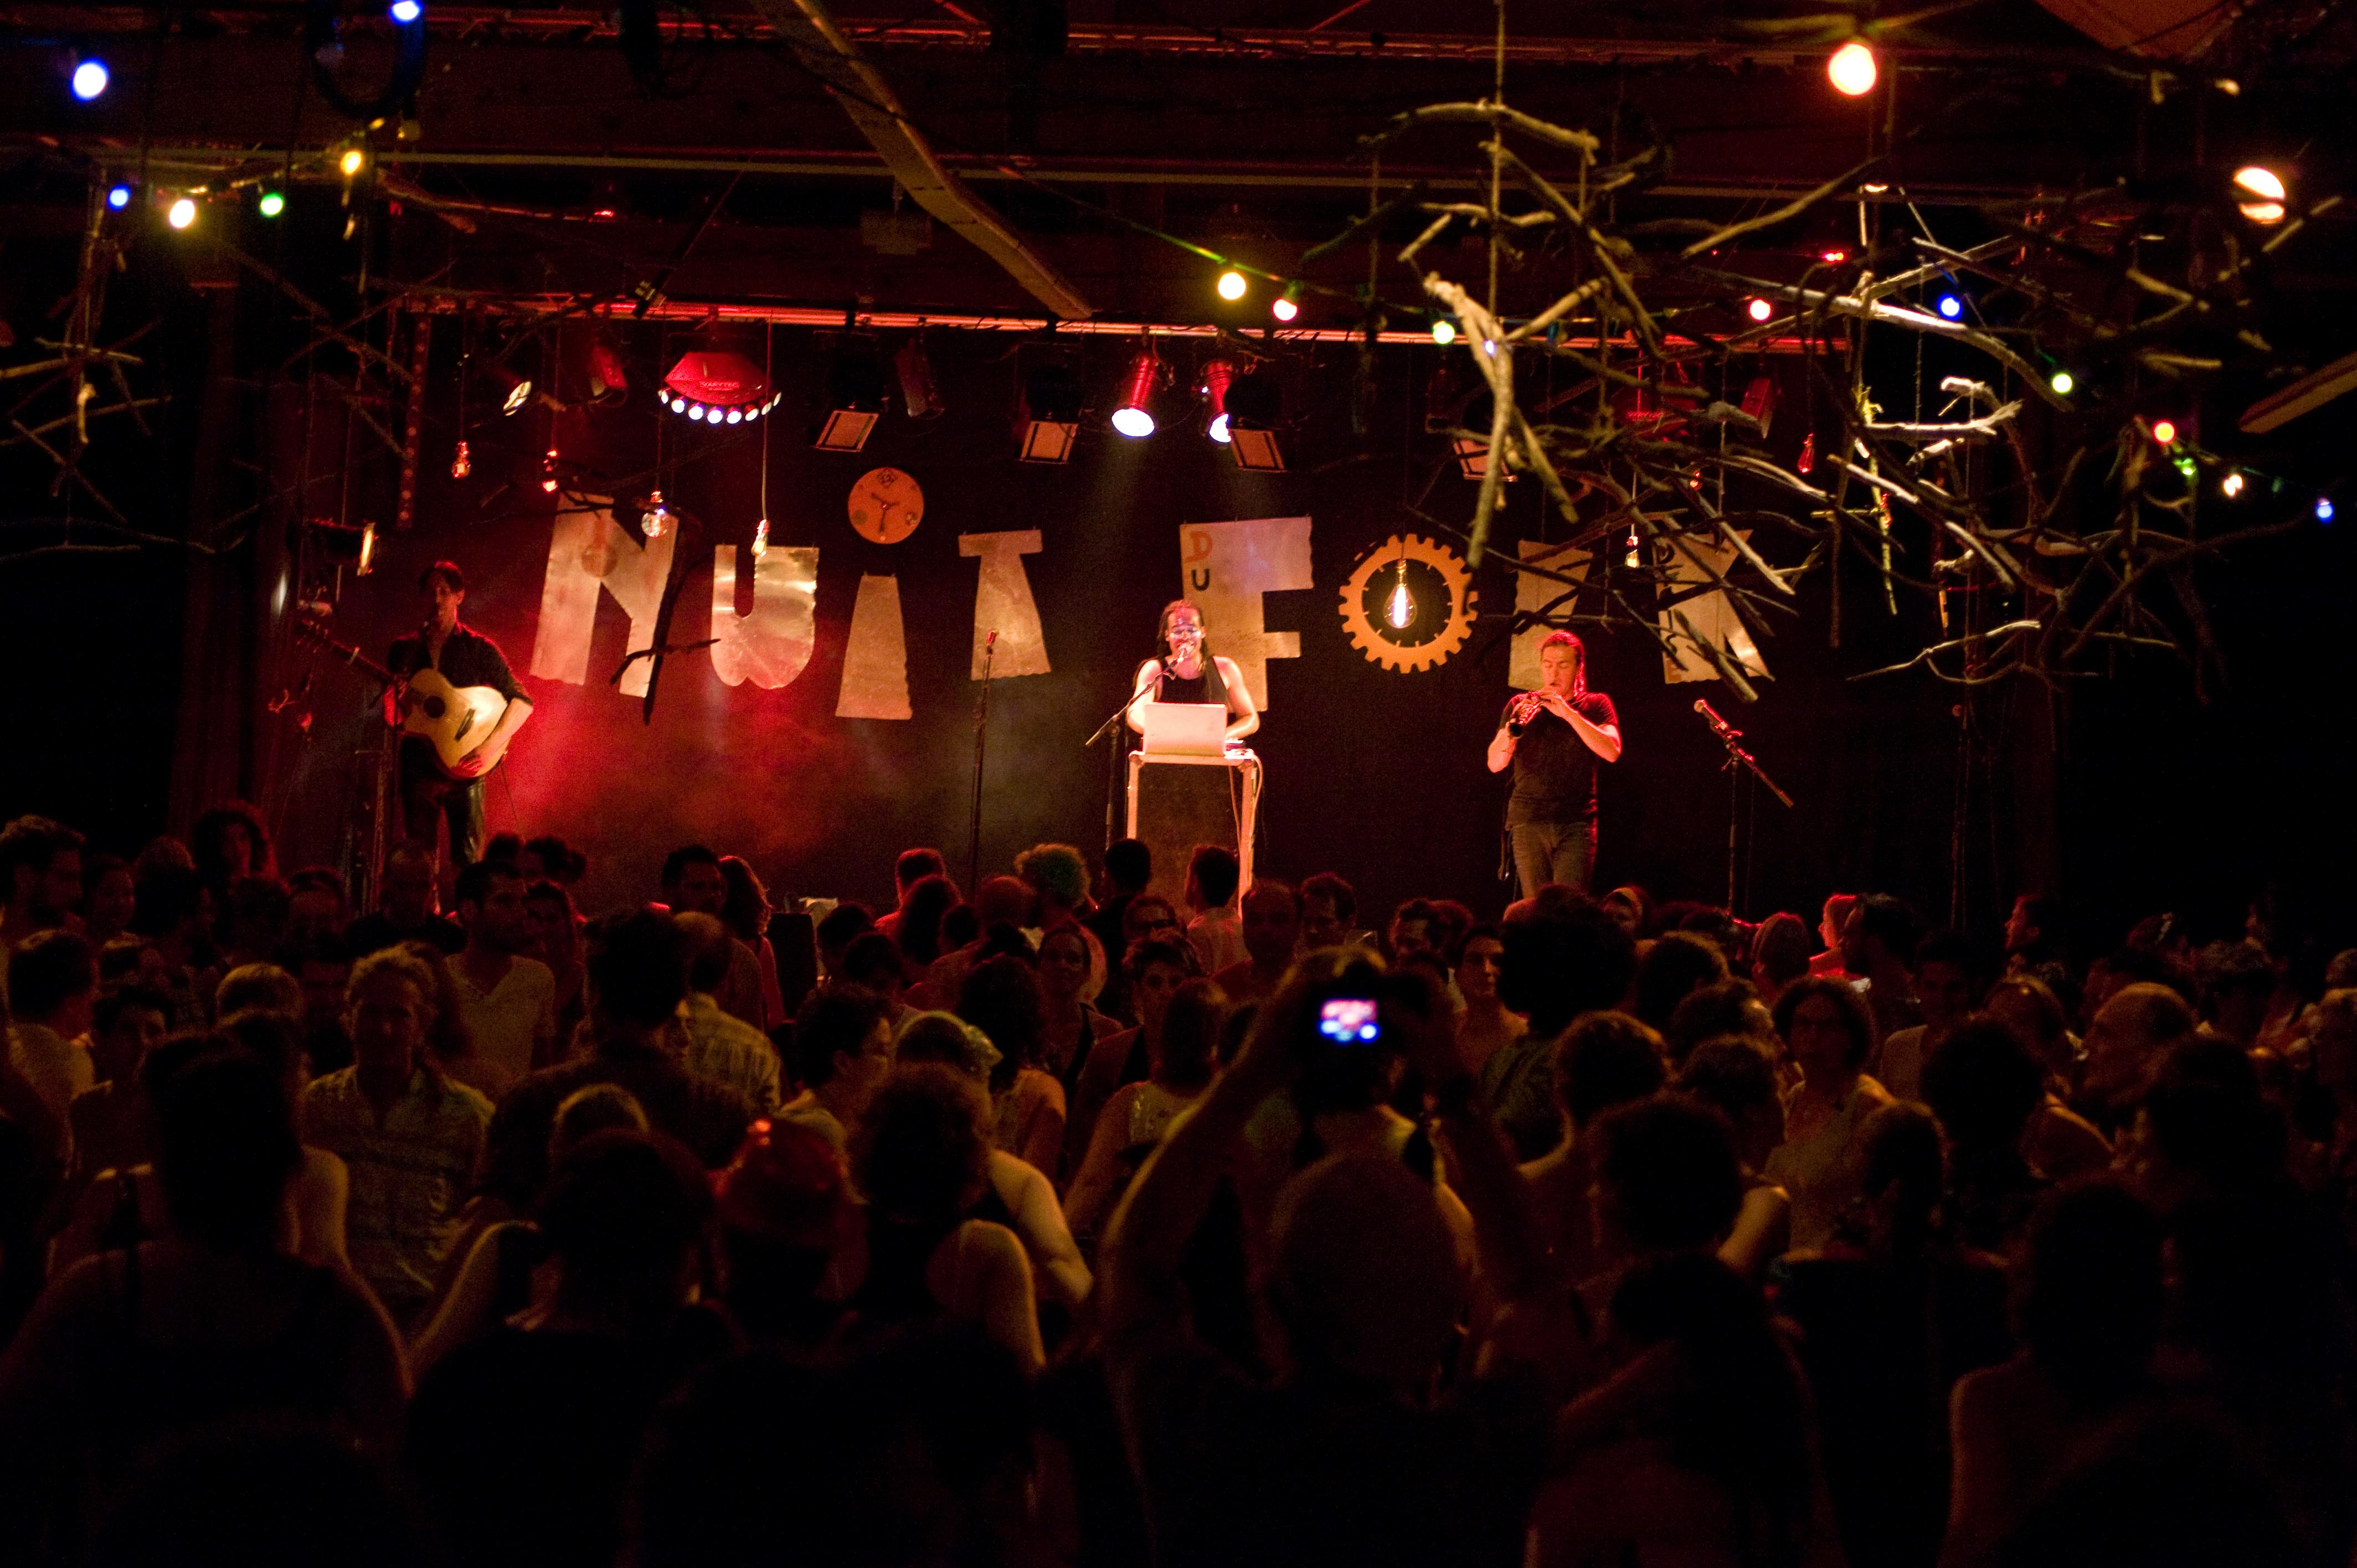 Nuit du Folk Dioise 2017 - ╕Sophie Dartigeas - 141